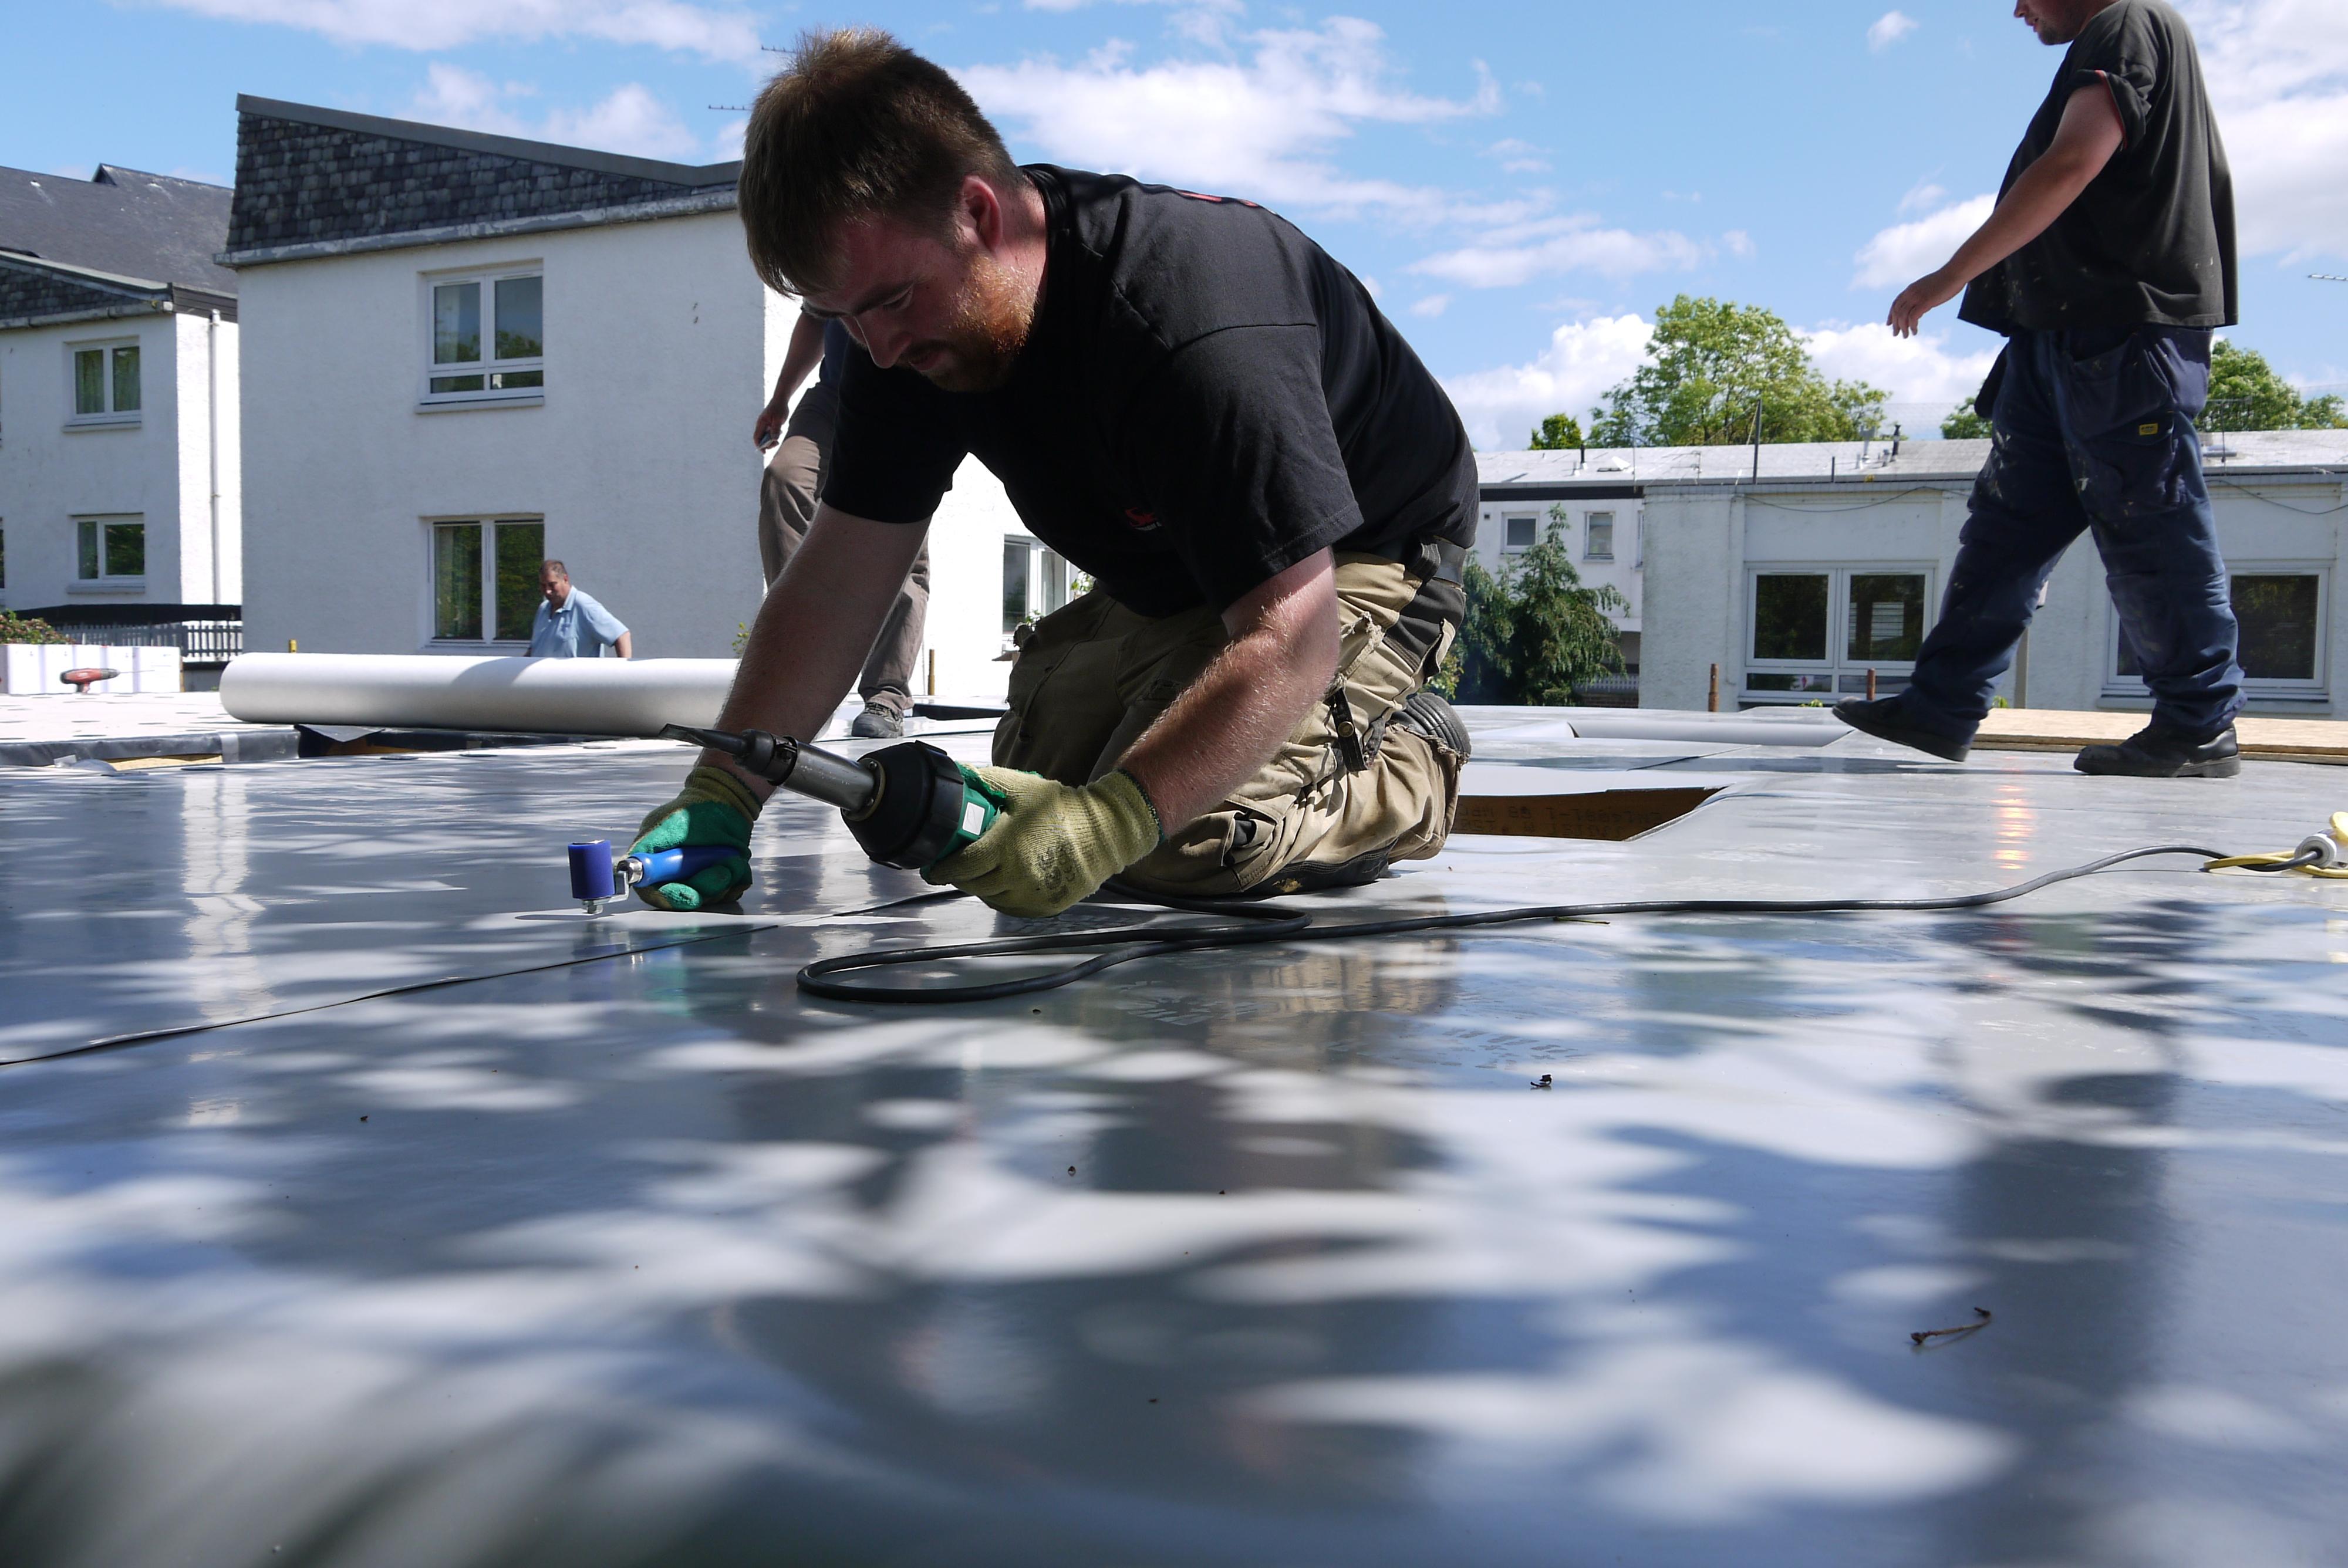 Waterproofing The Roof